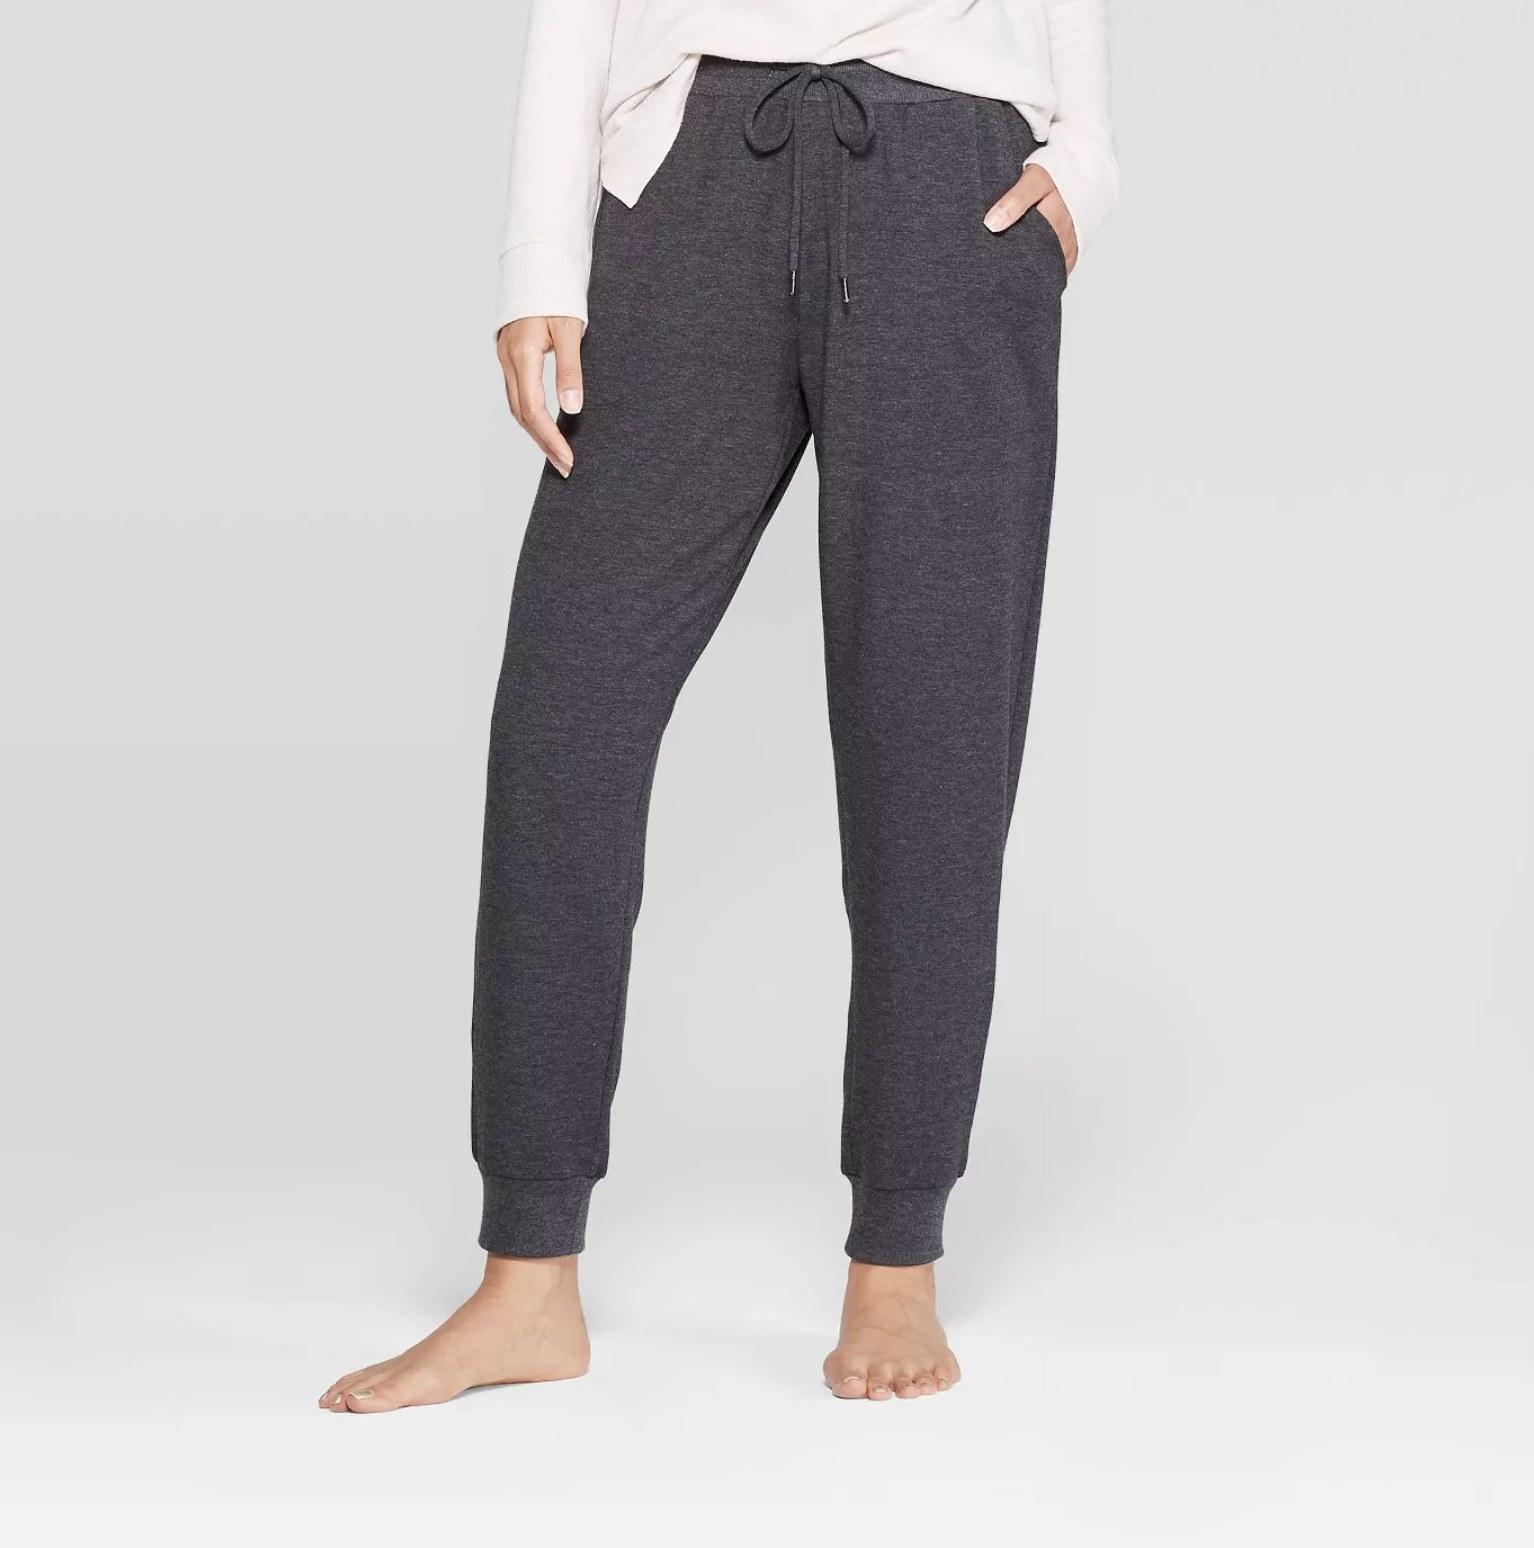 Model wearing the grey sweatpants